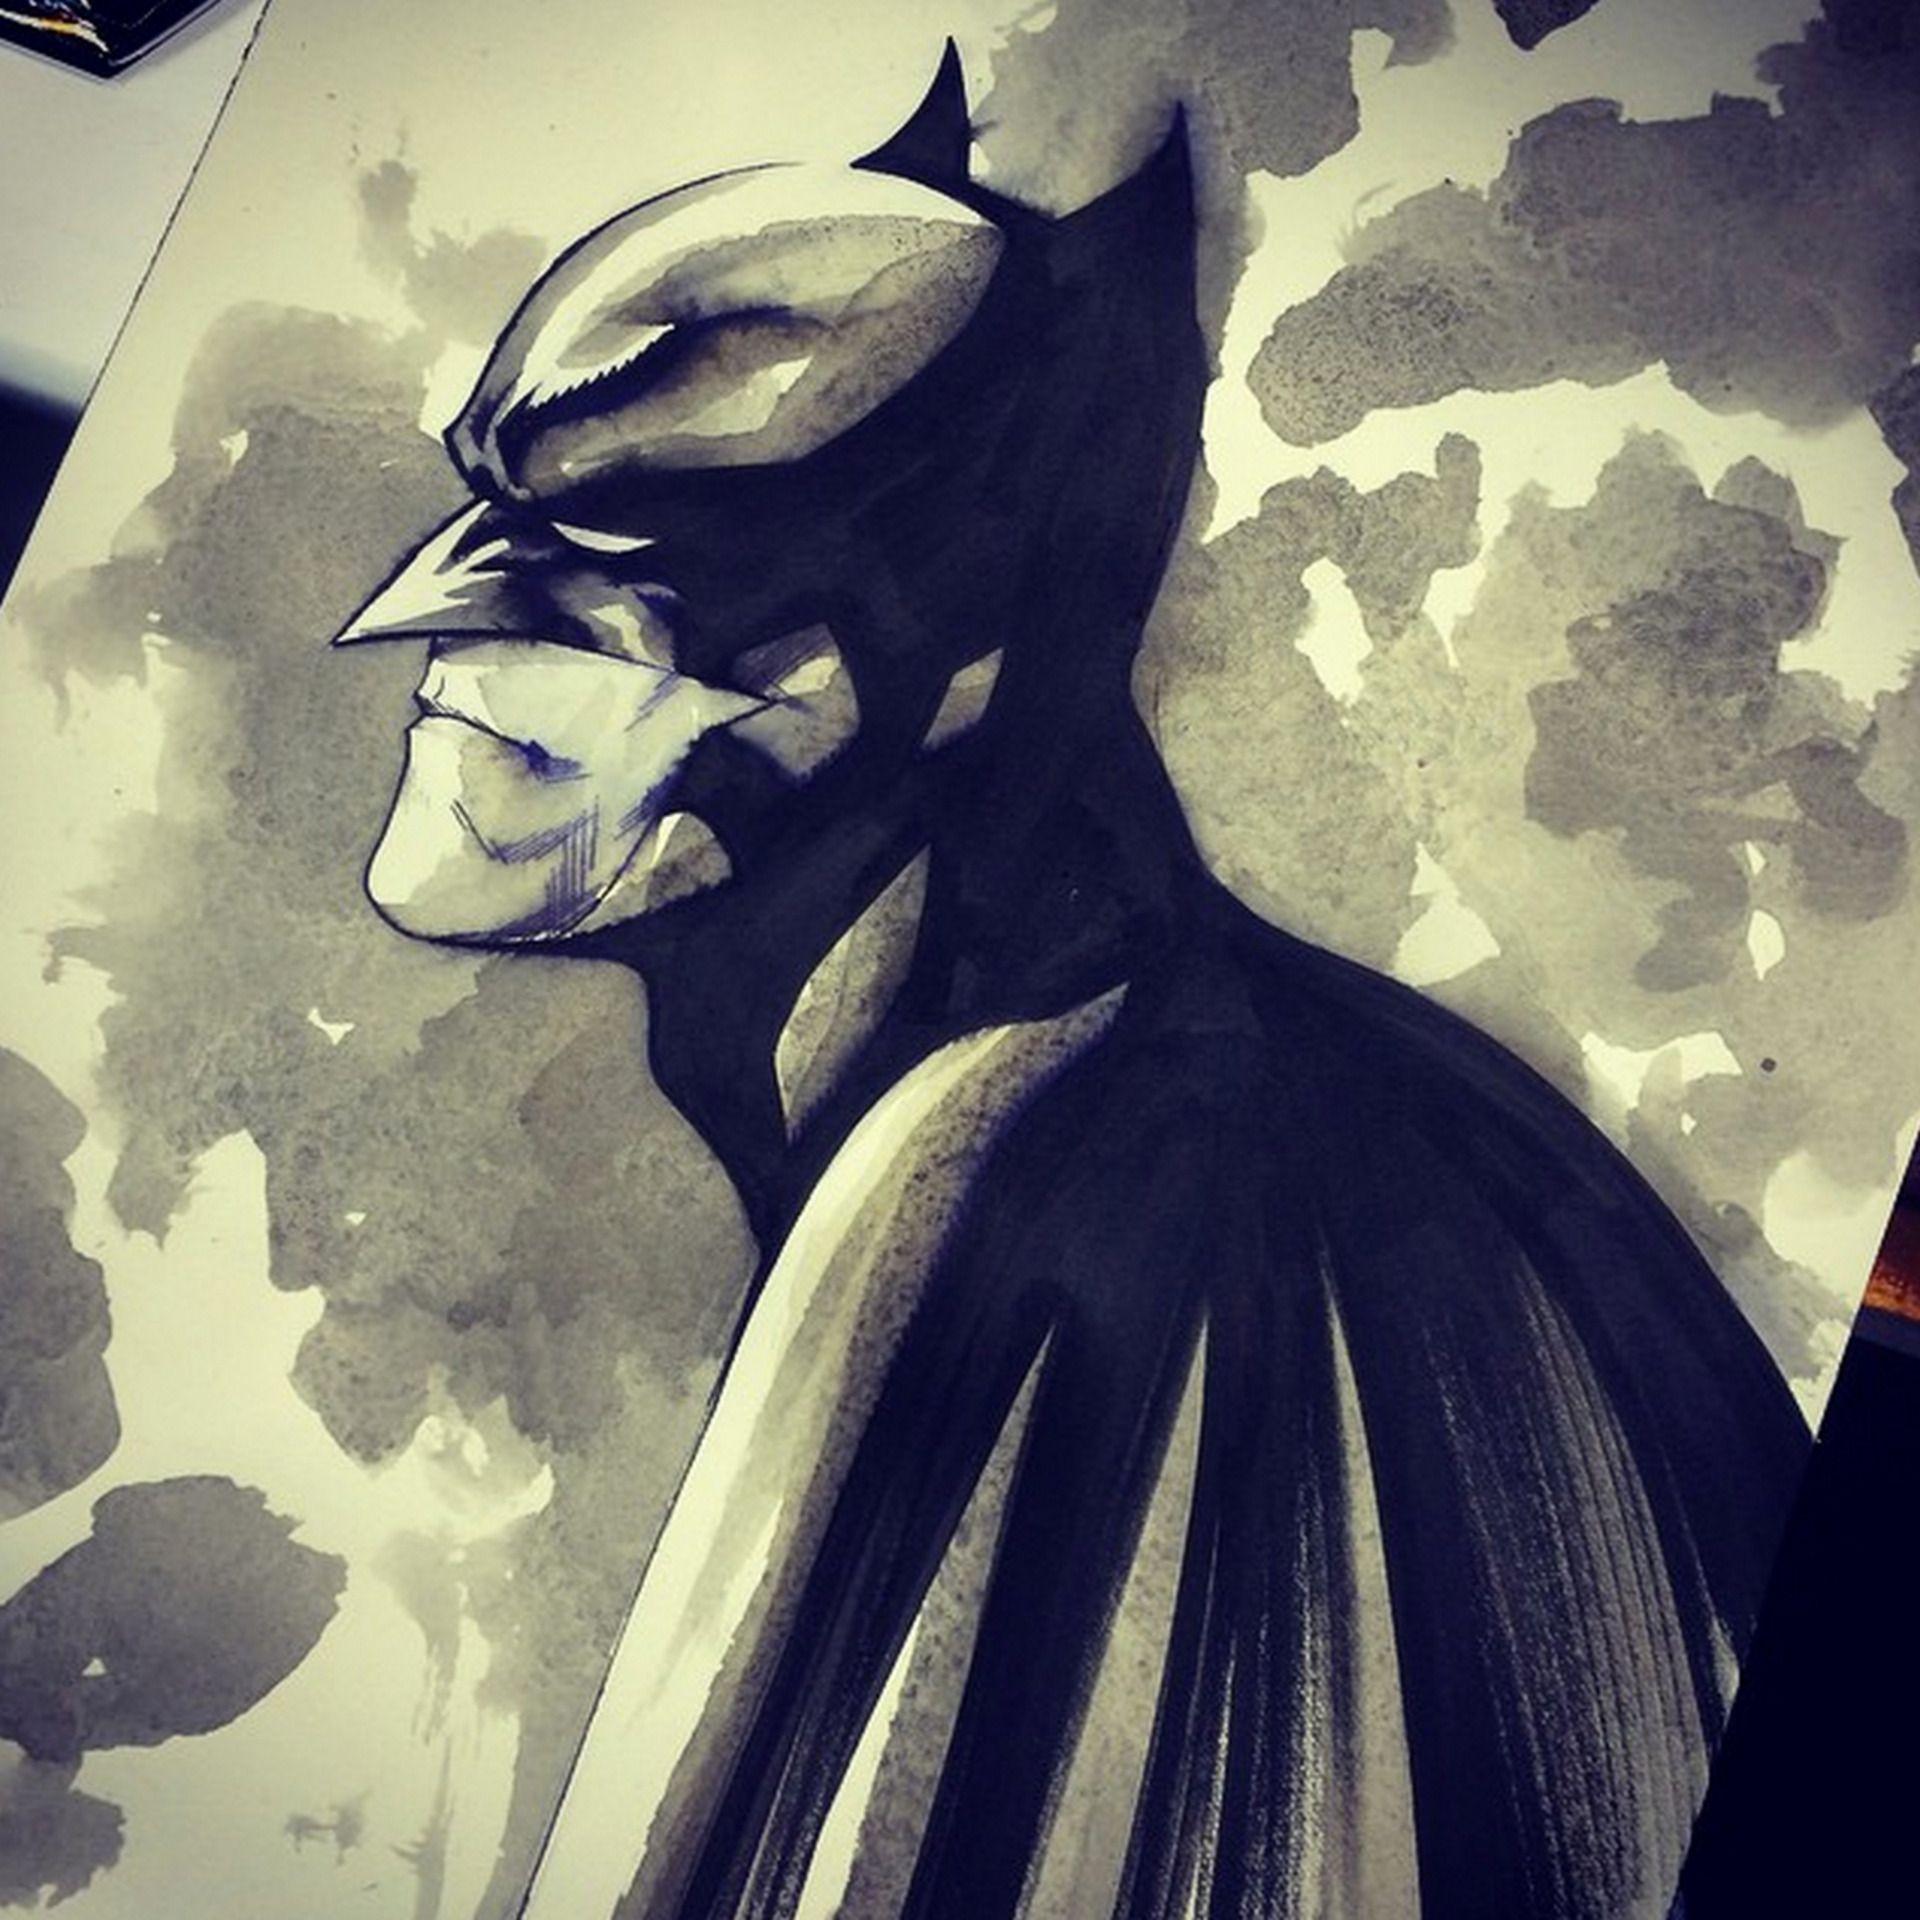 Batman by Mike McKone